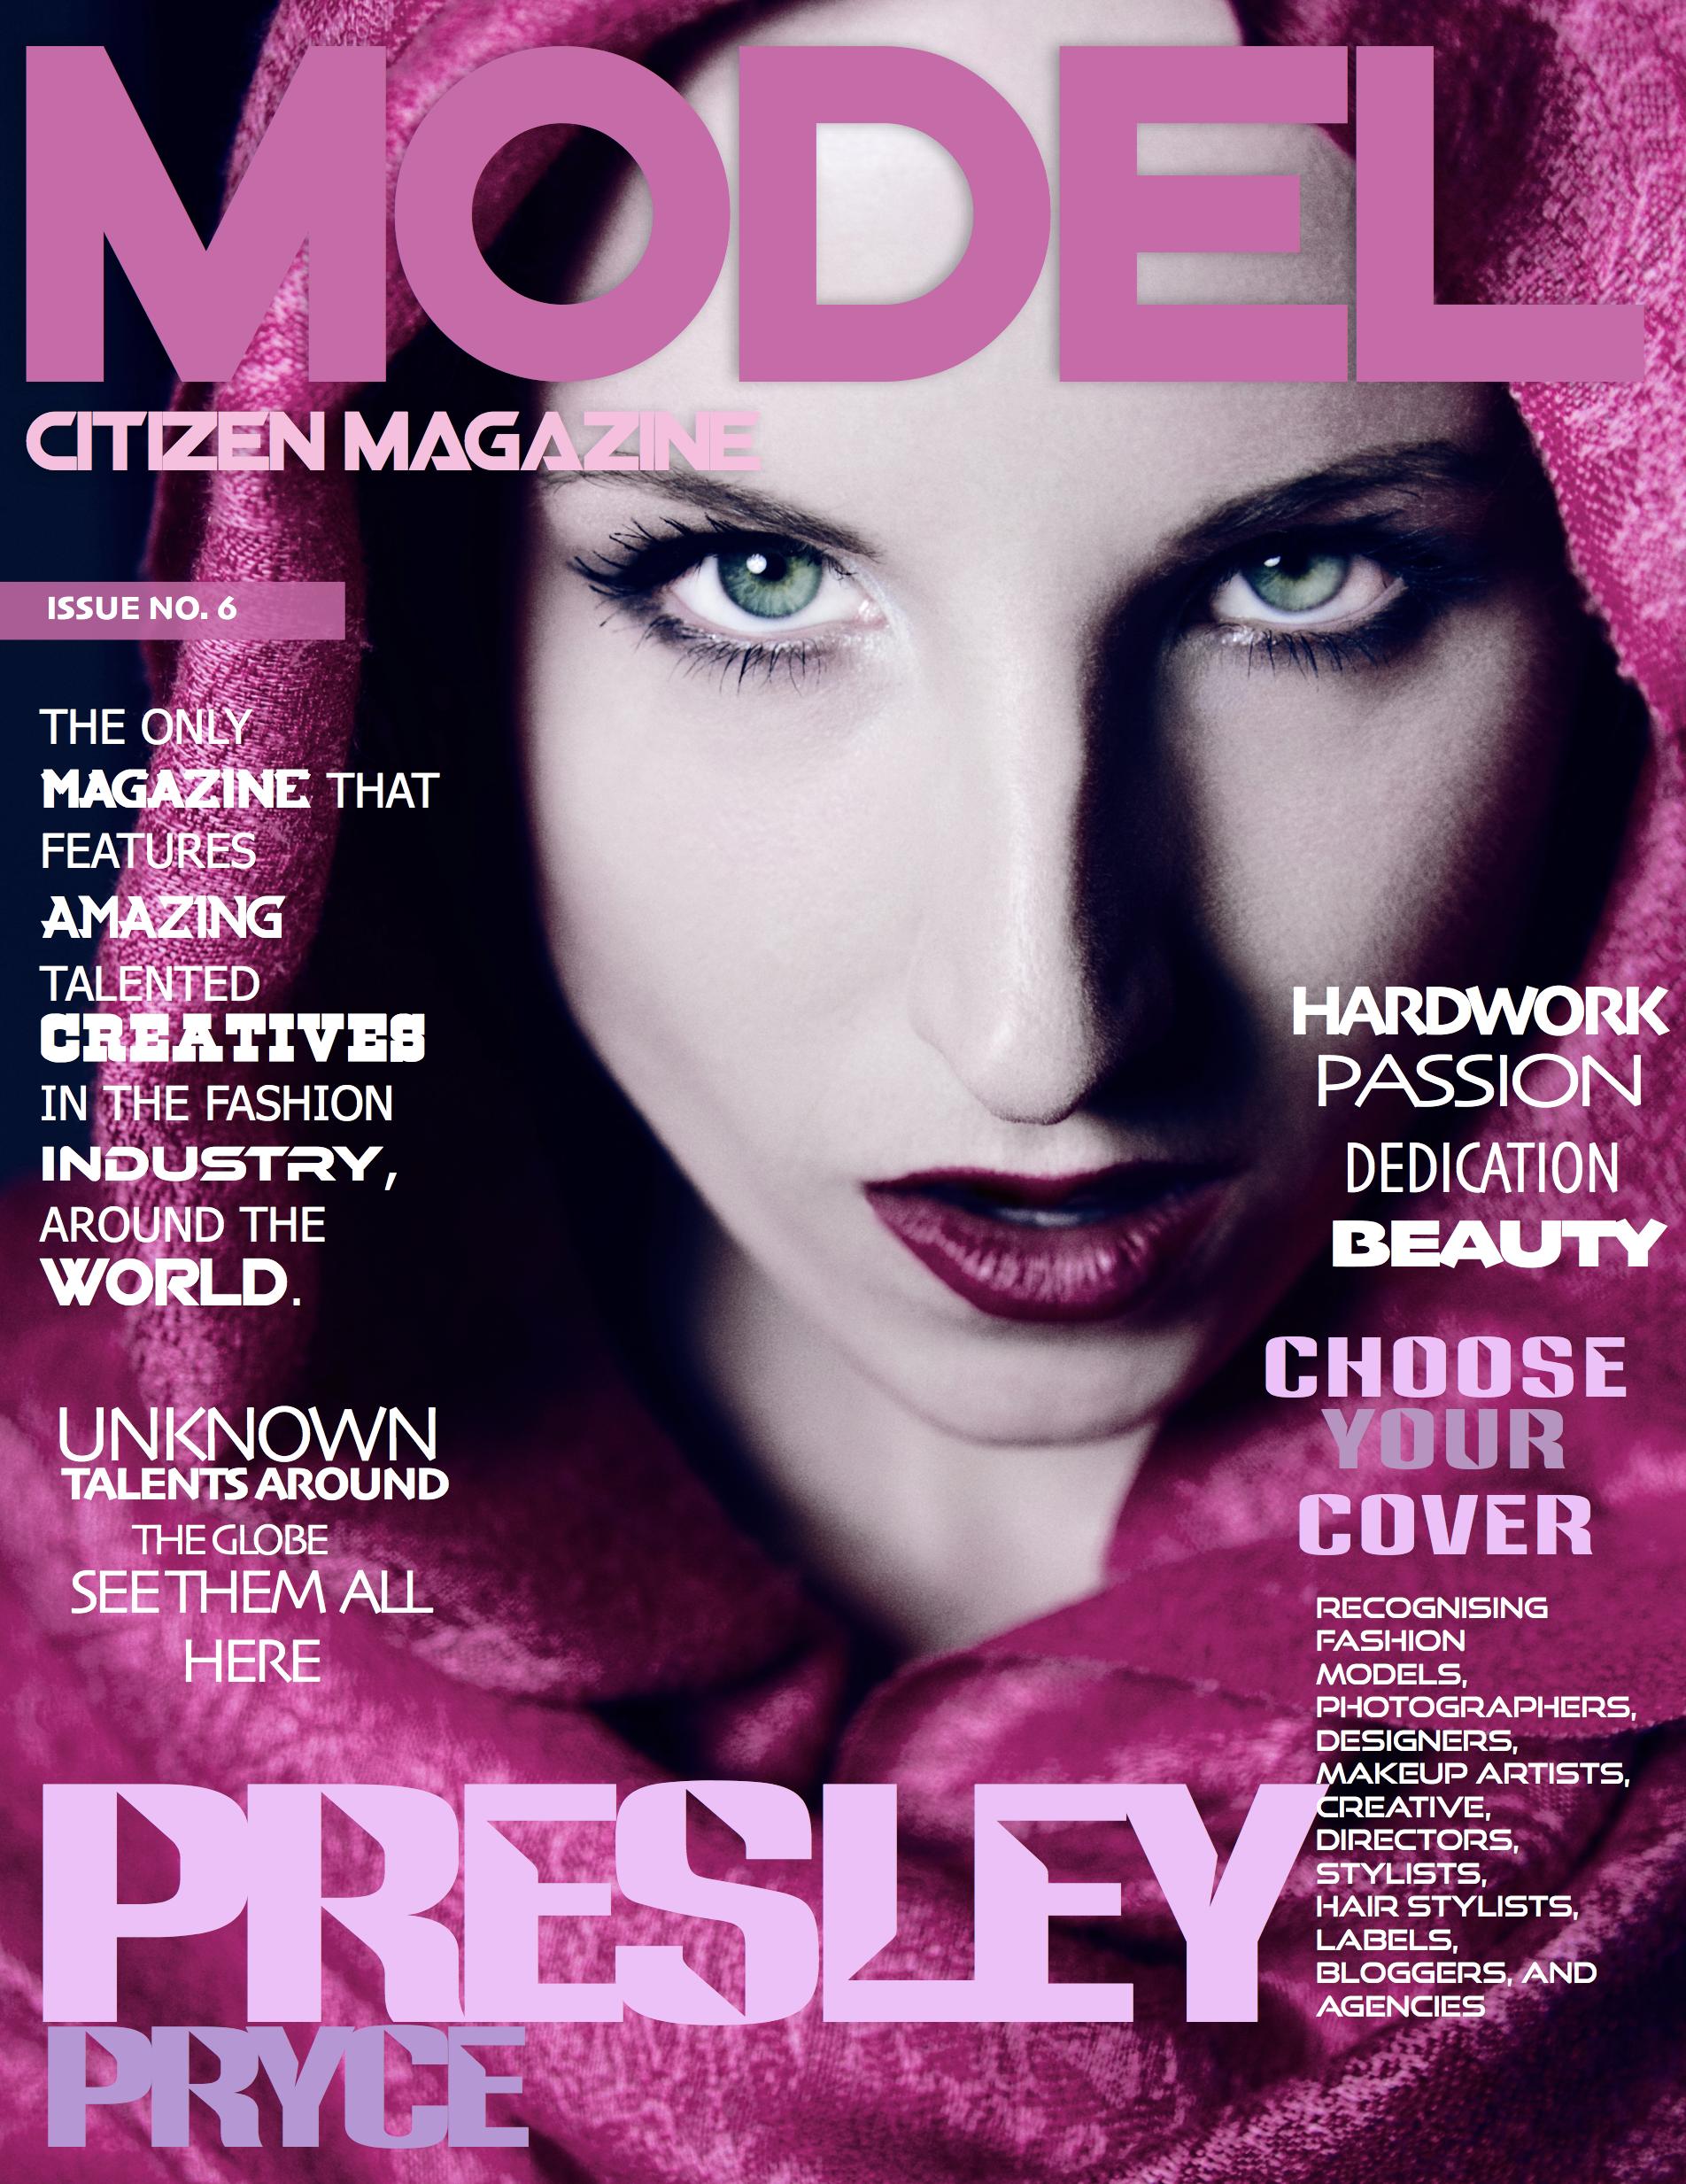 Presley Pryce, Model Citizen Magazine